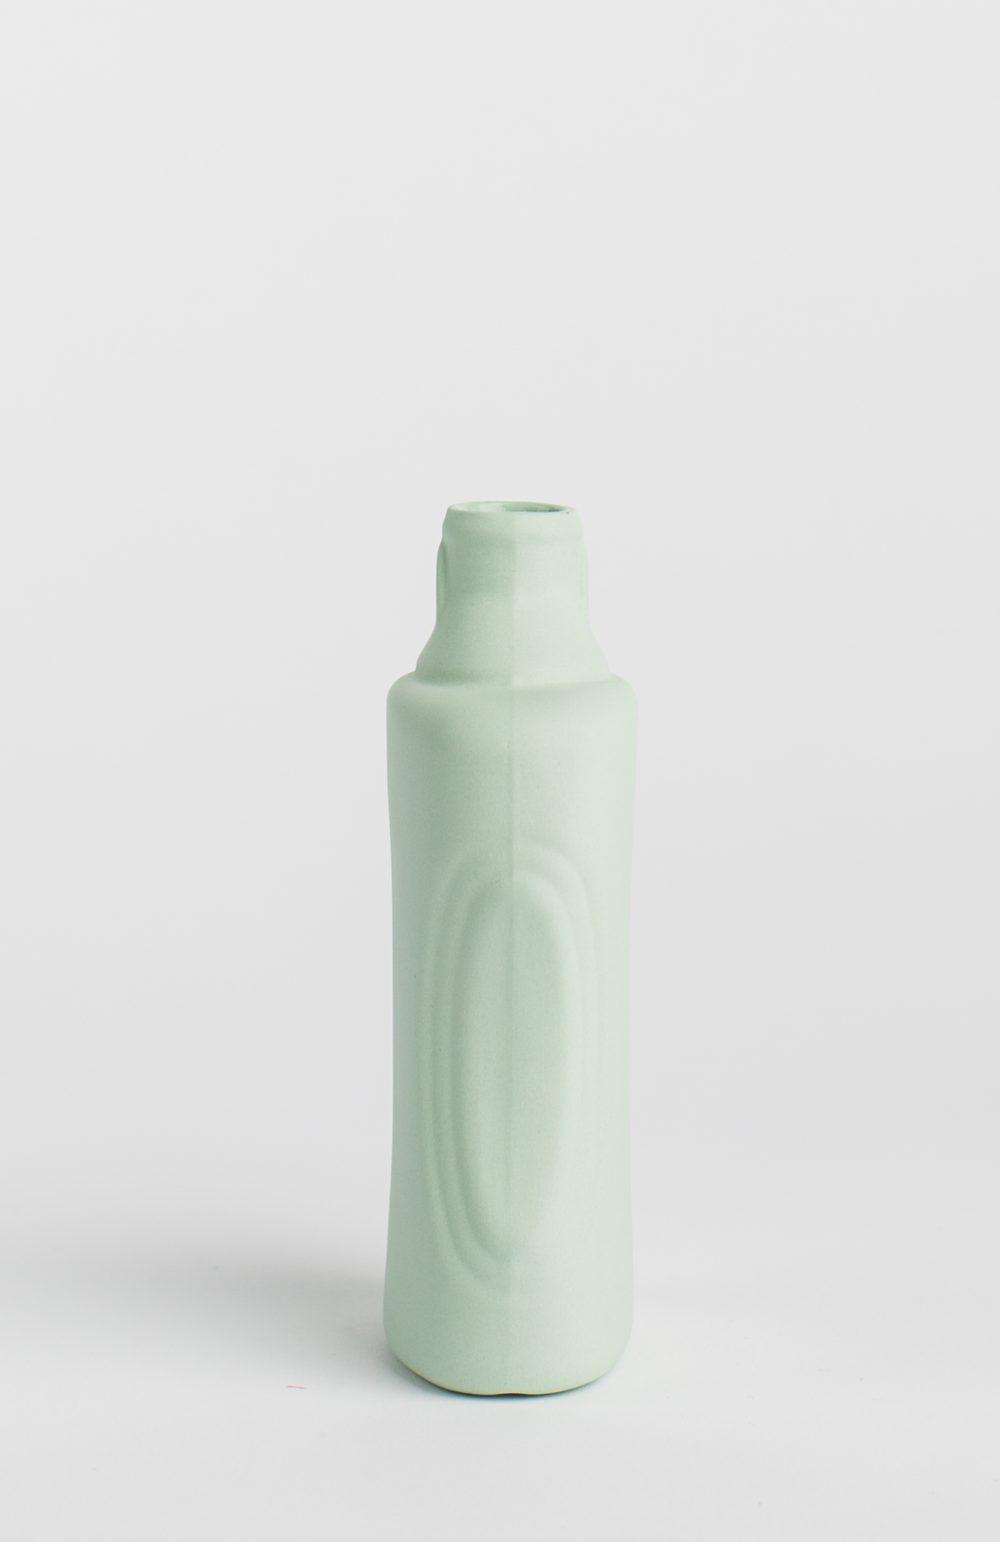 bottle vase #21 mint